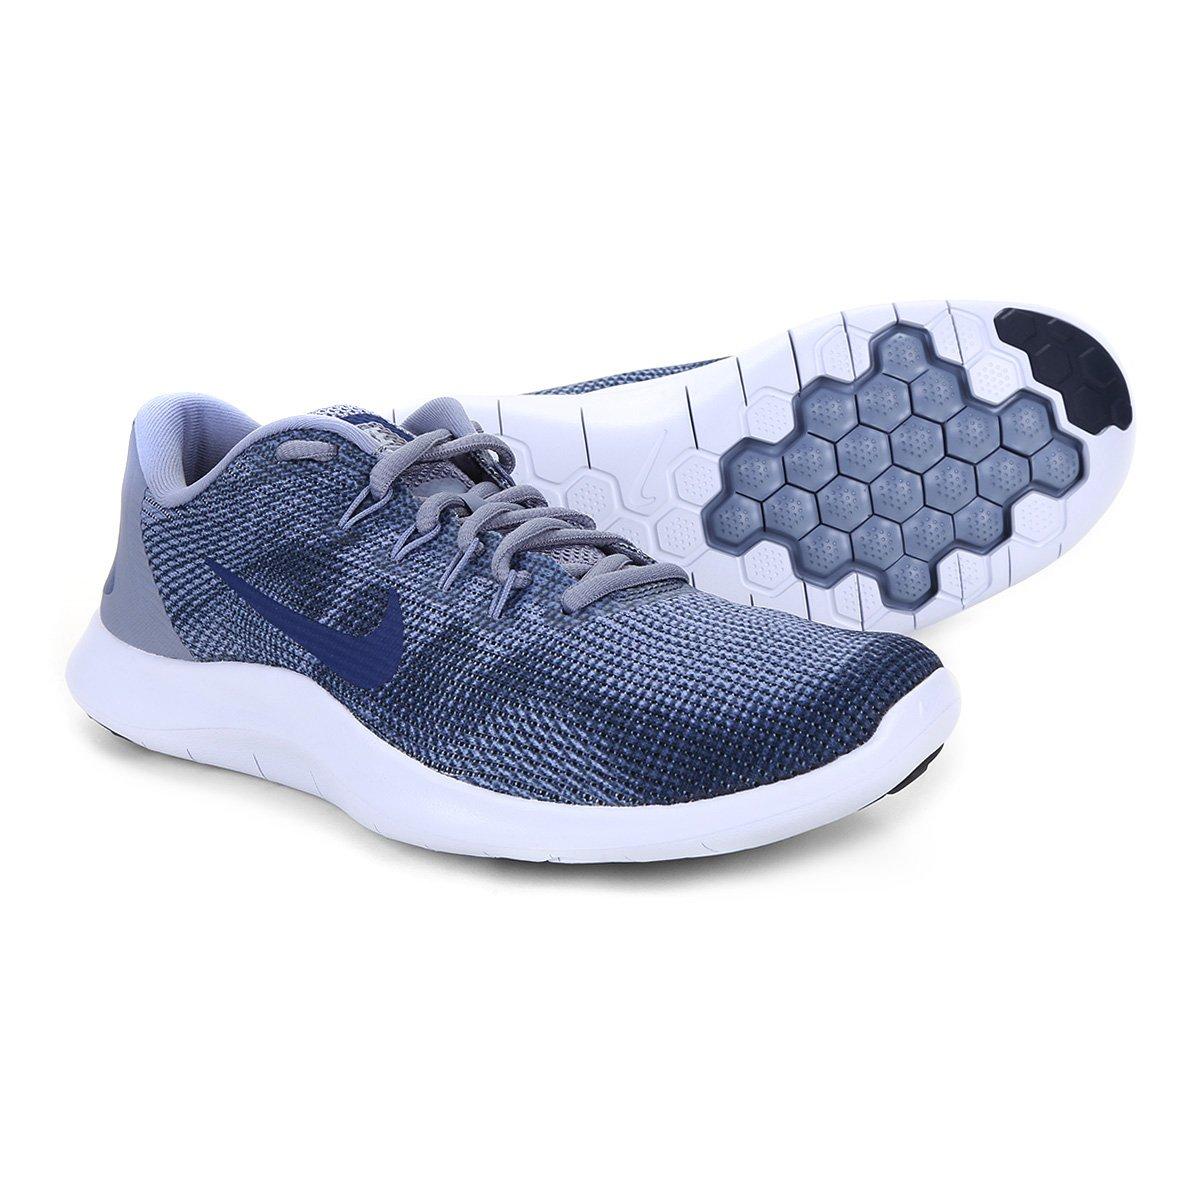 Tênis Nike Flex 2018 Rn Rn 2018 Masculino Compre Agora Netsapatos 9490c5